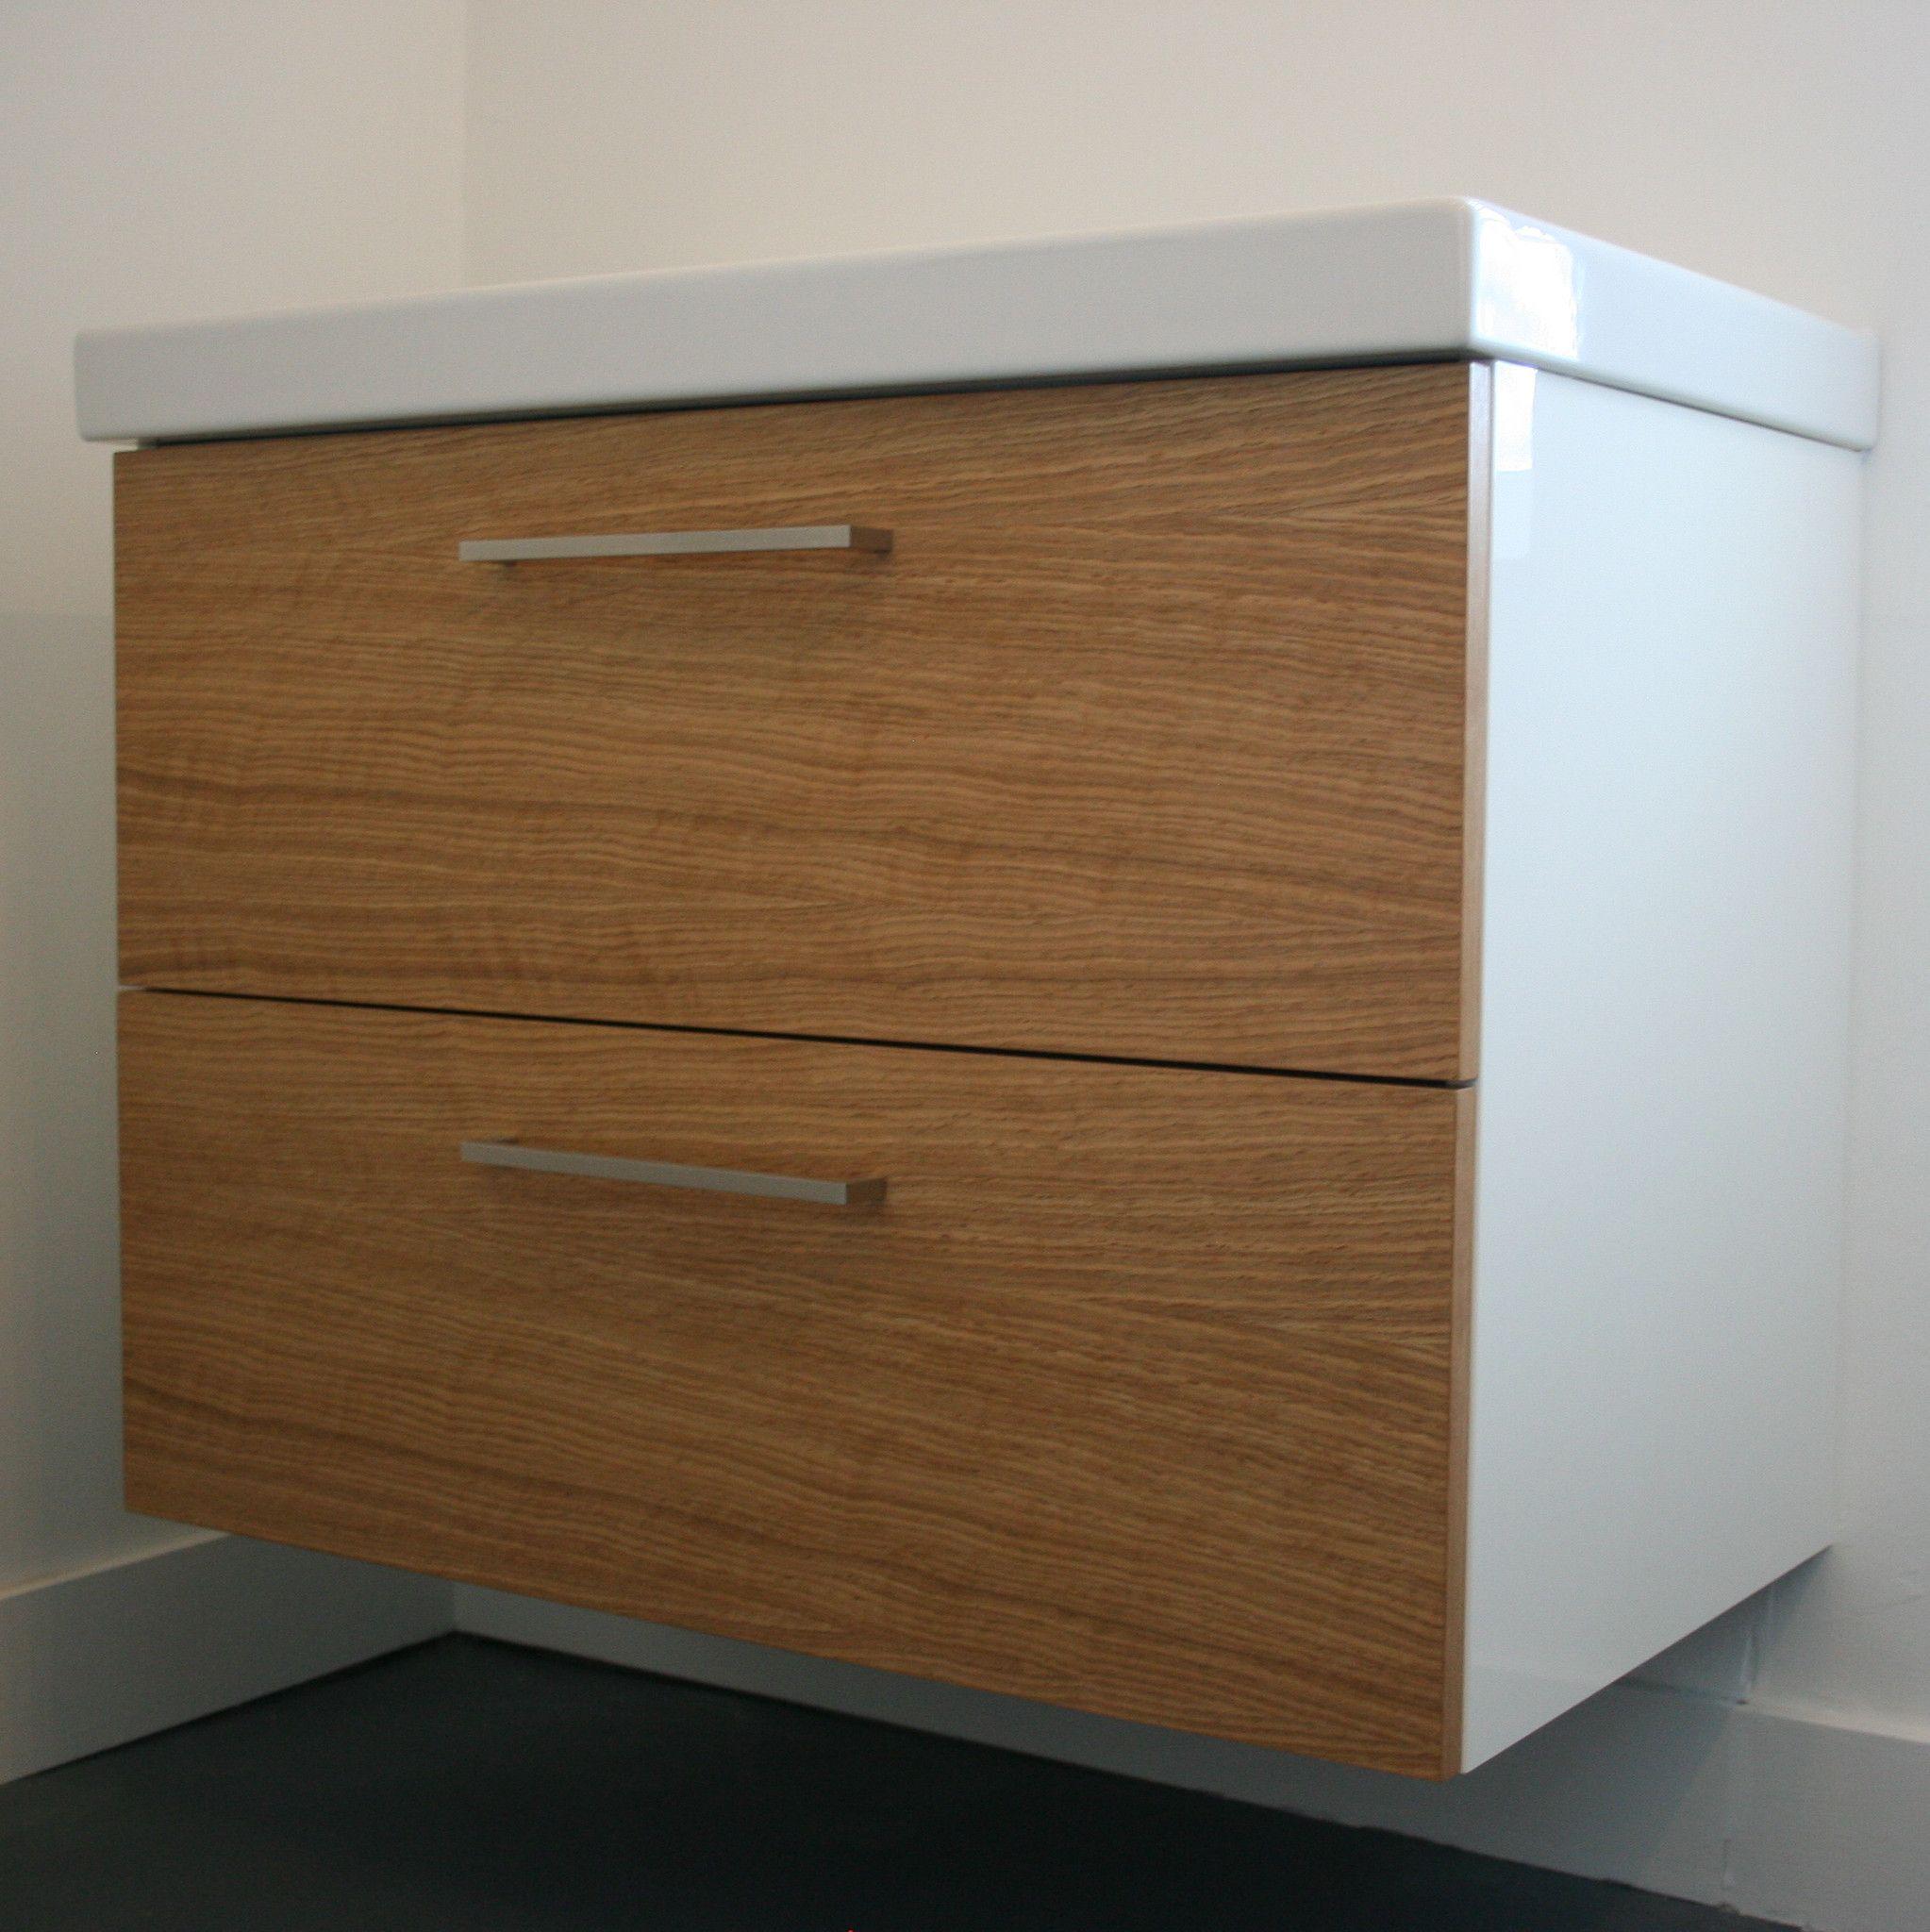 Custom Bathroom Vanity Doors oak godmorgon - custom fronts for ikea cabinets | b